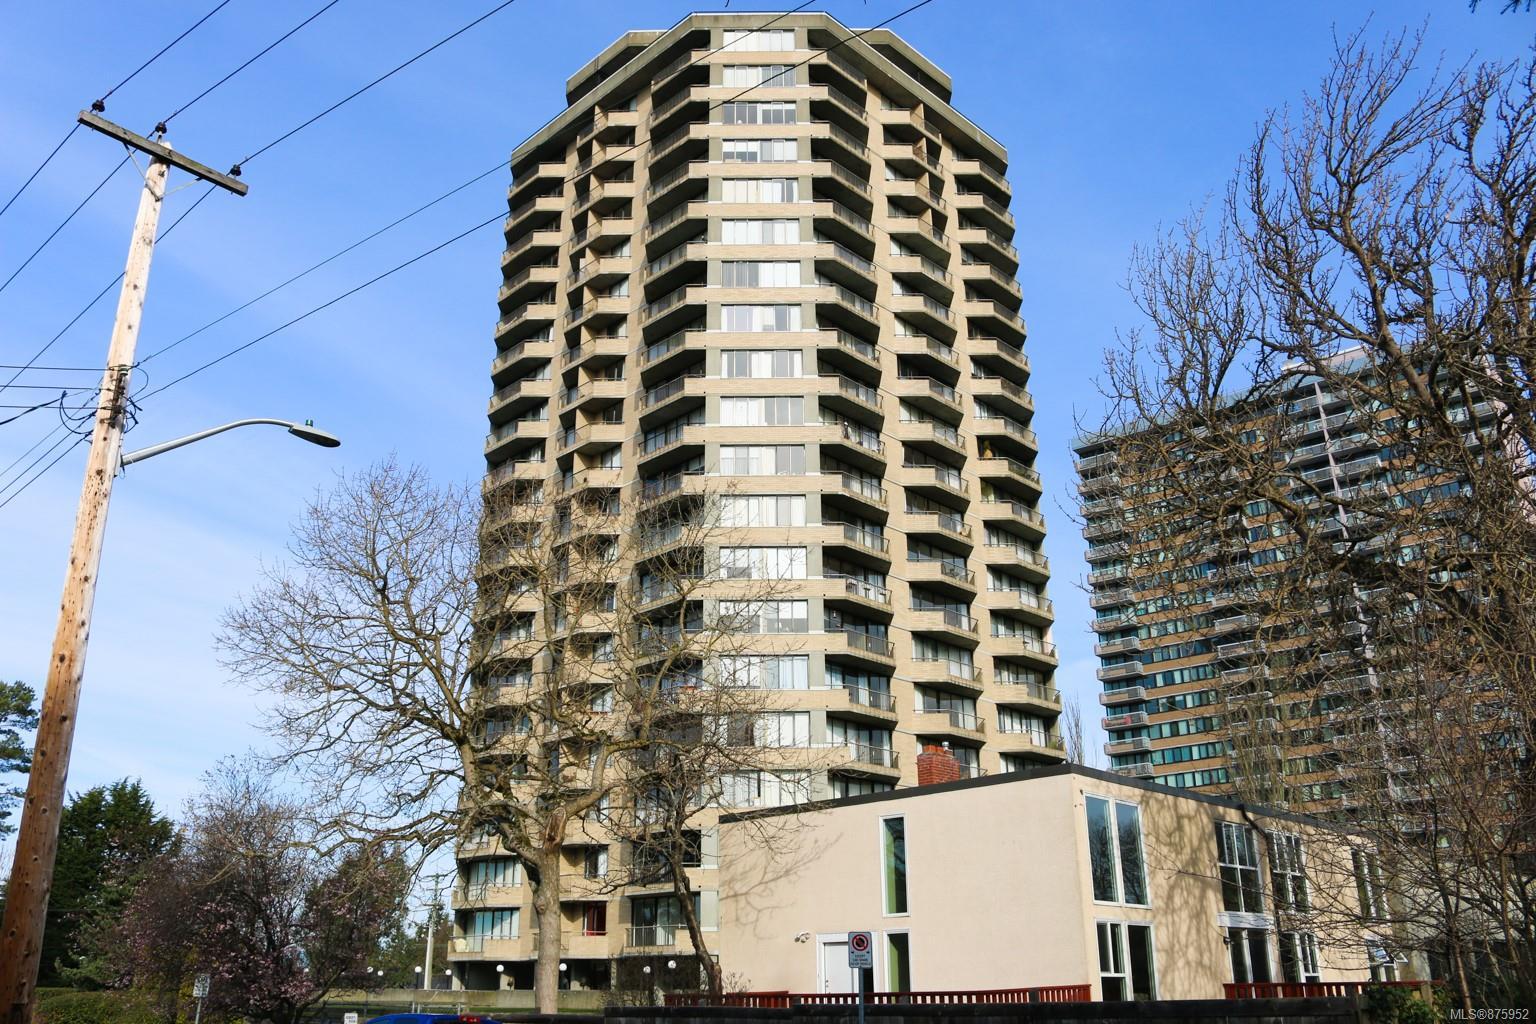 210 - 620 Toronto Street, James Bay, Victoria photo number 2